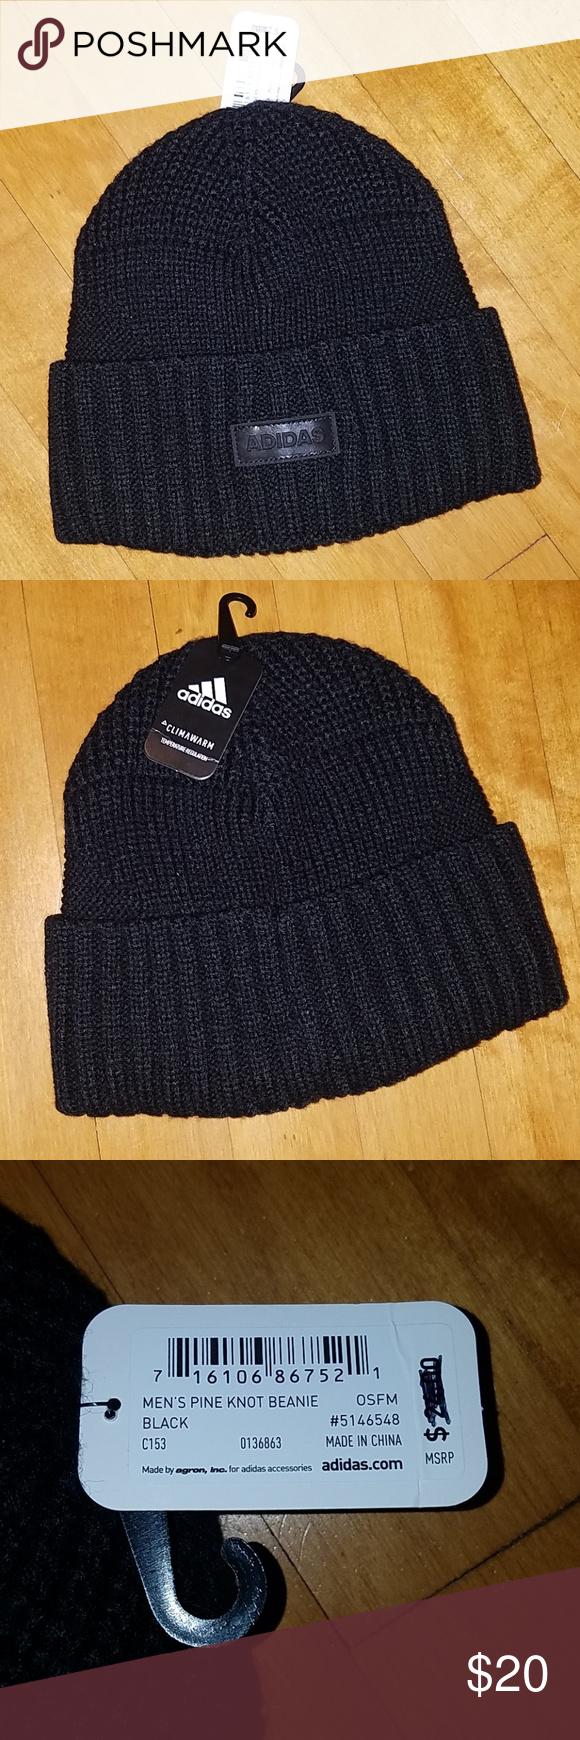 782912142 Adidas Climawarm Black Warm Beanie Knit hat Men's Pine knot beanie ...